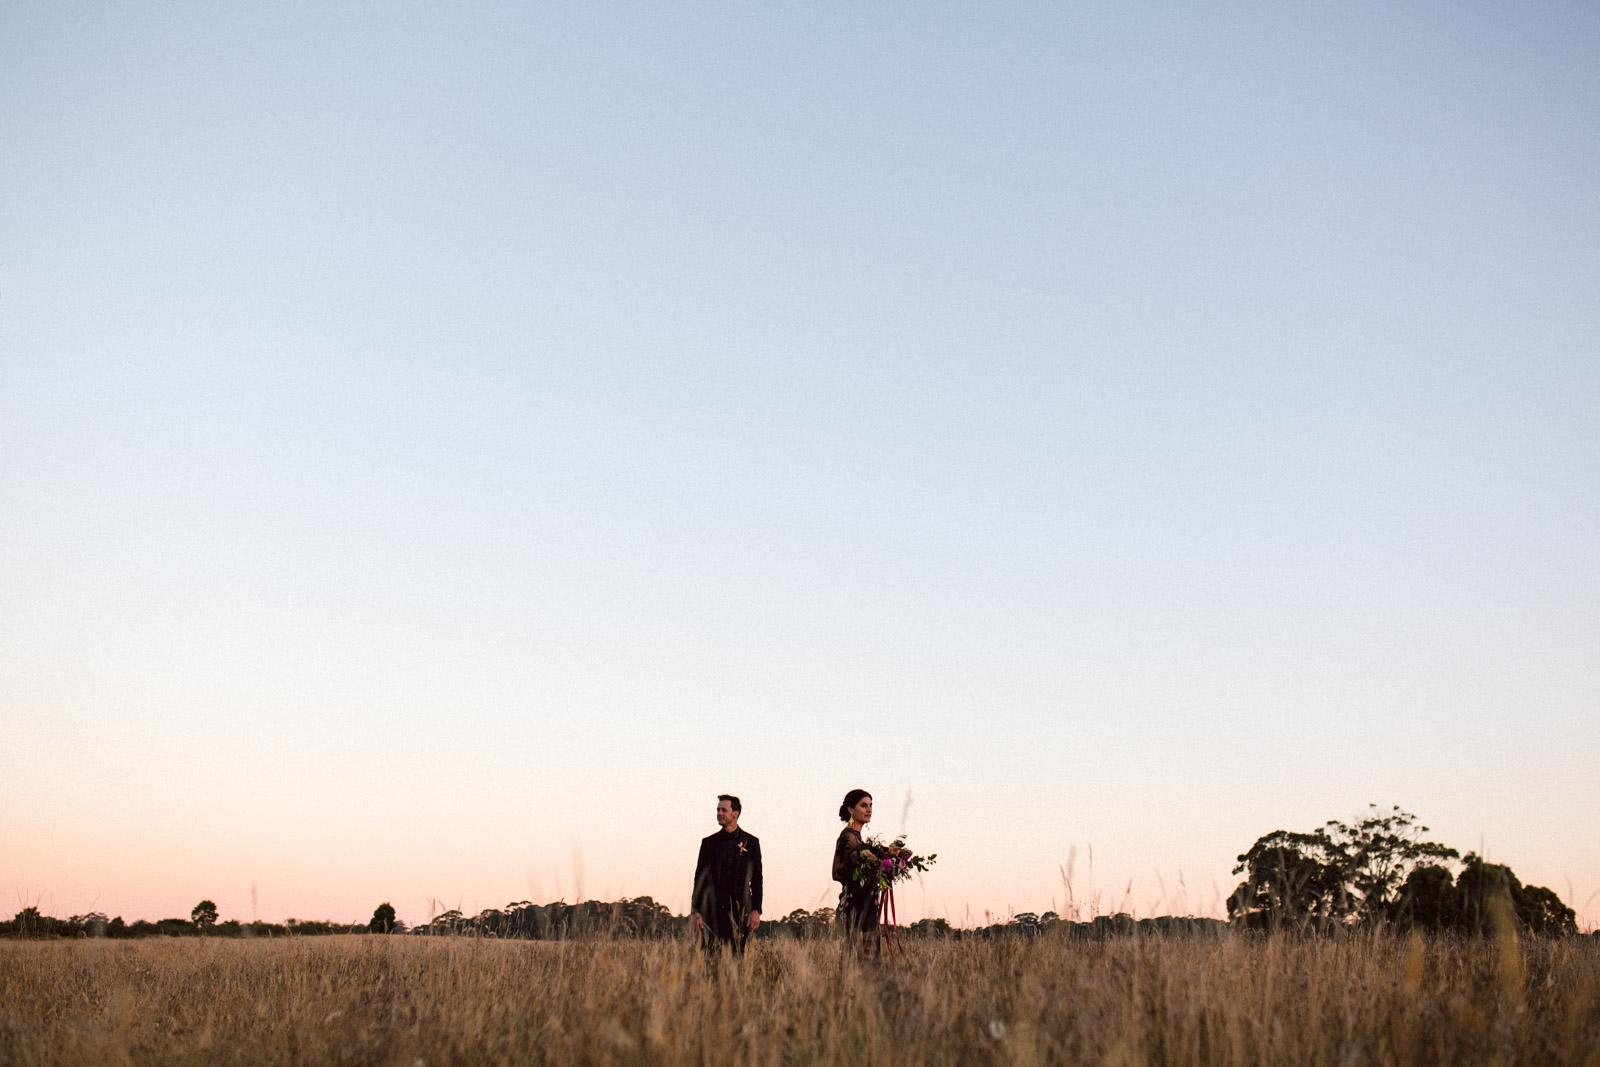 Zara & Danny 18.32017 Married in Daylesford, Australia